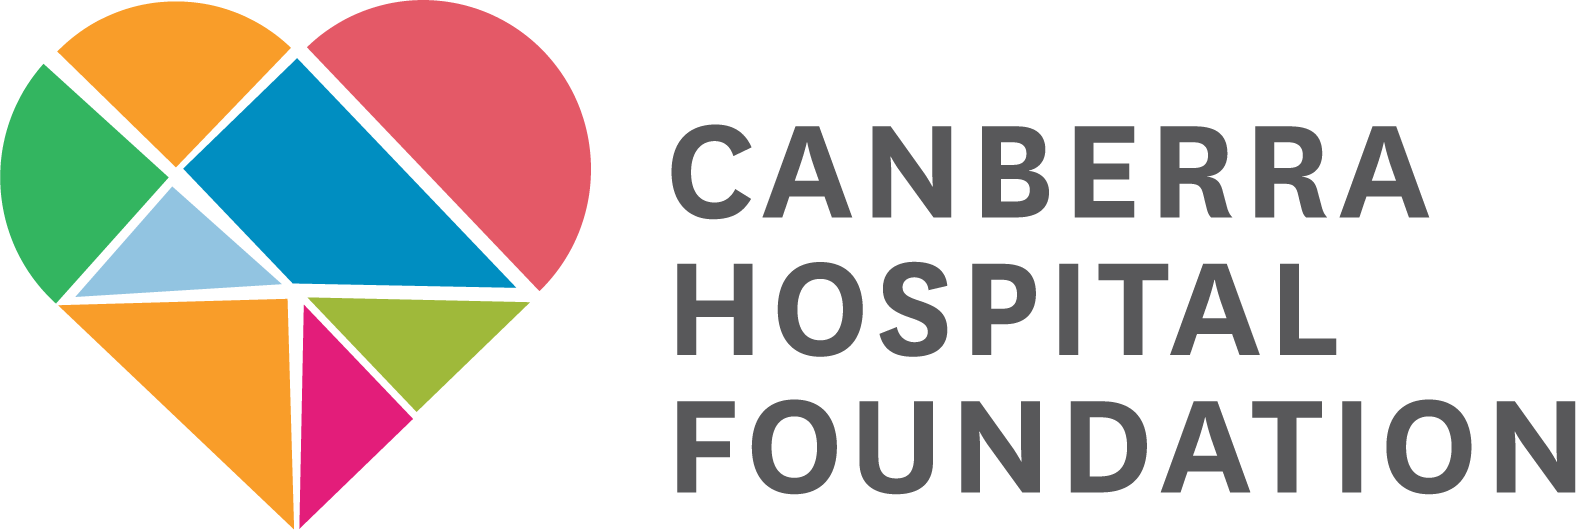 Canberra Hospital Foundation